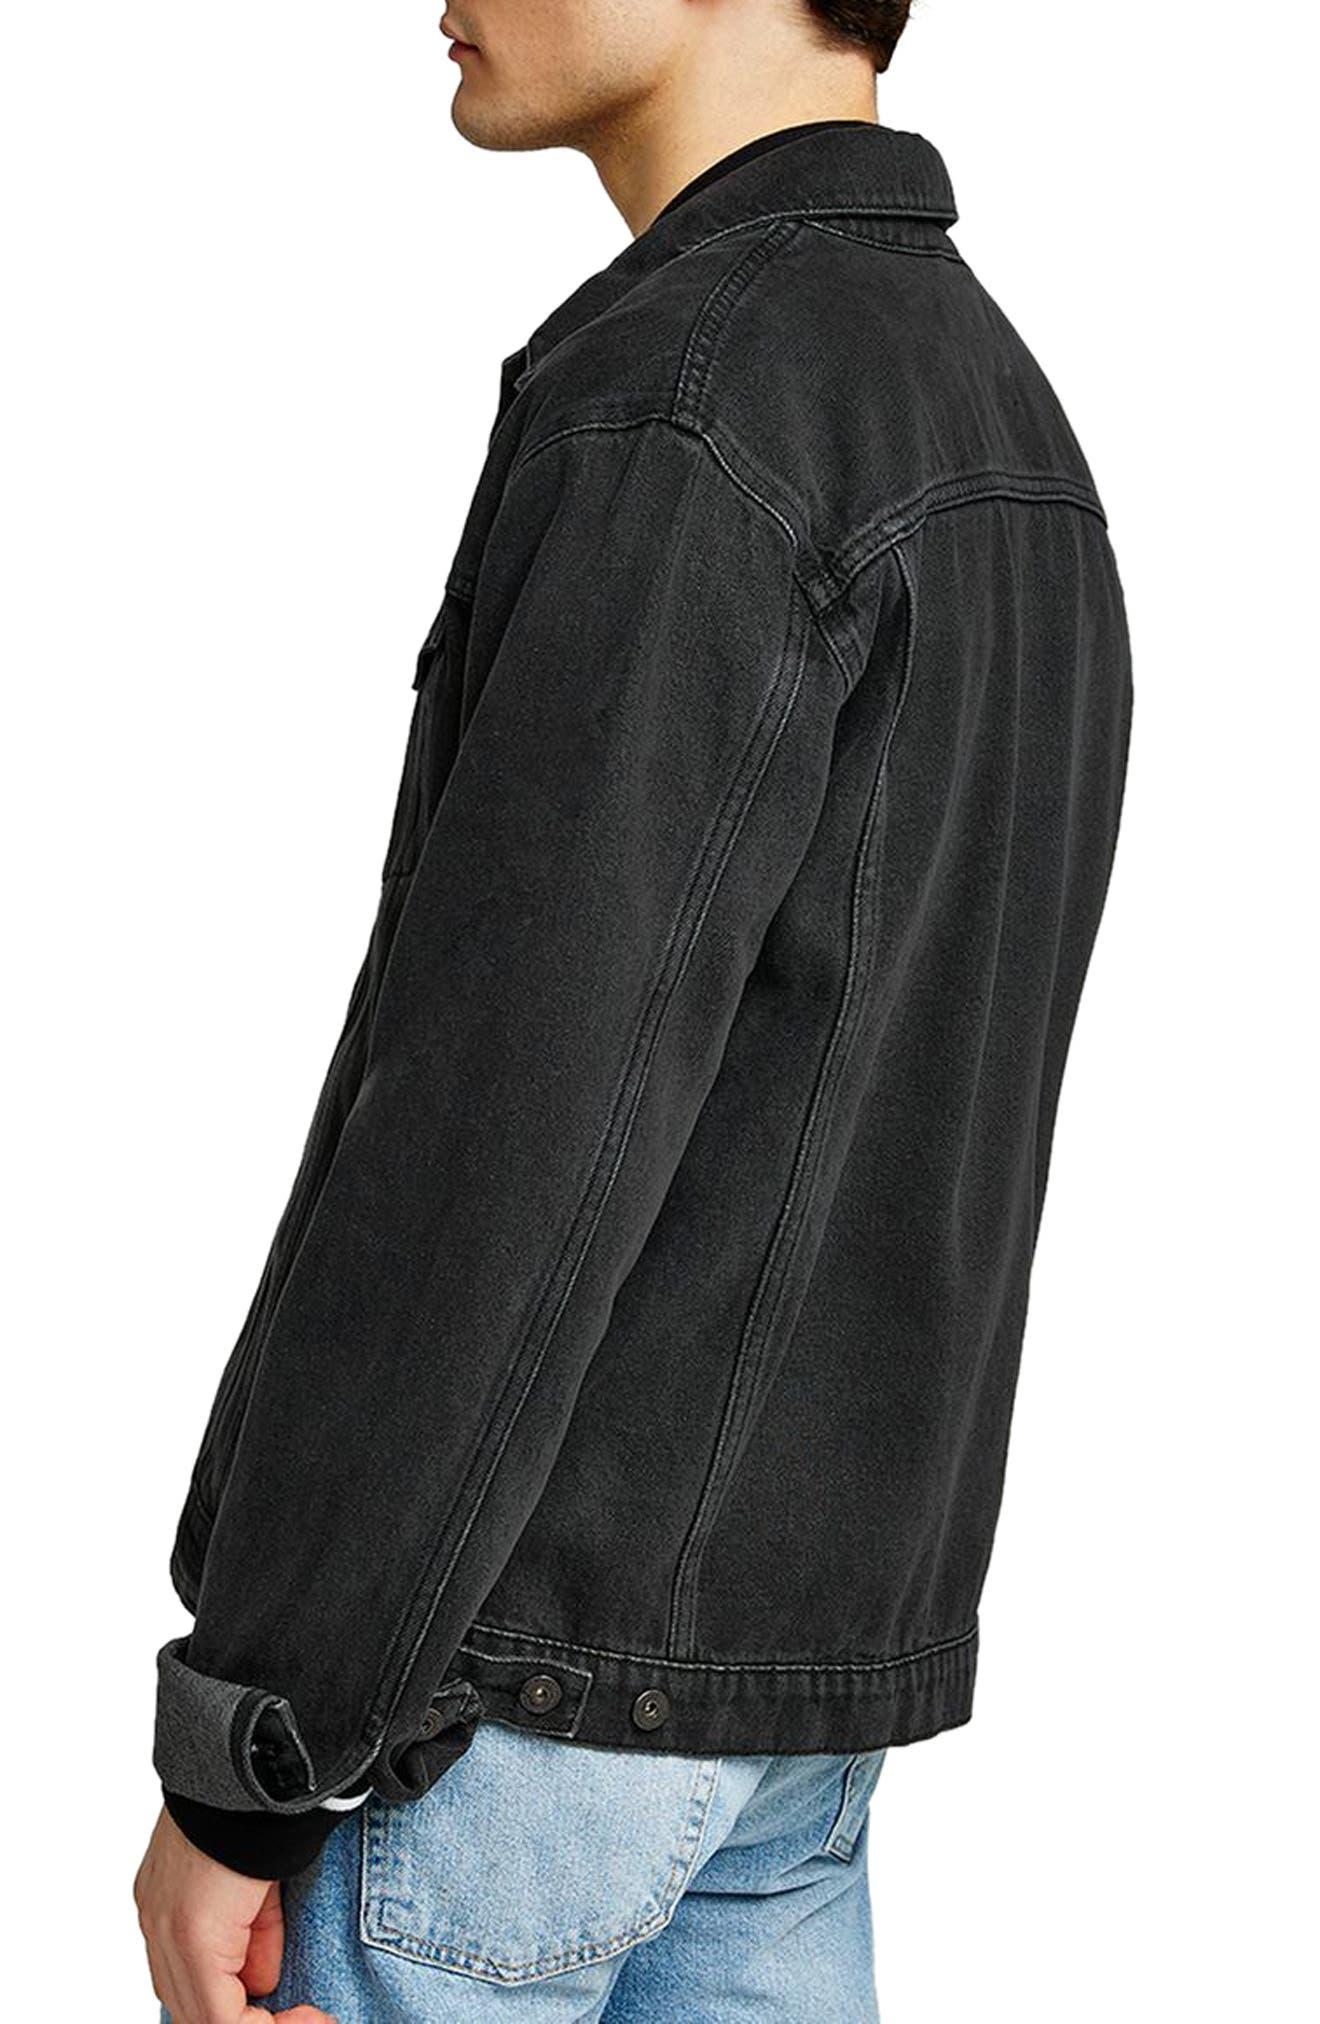 Western Denim Jacket,                             Alternate thumbnail 2, color,                             Black